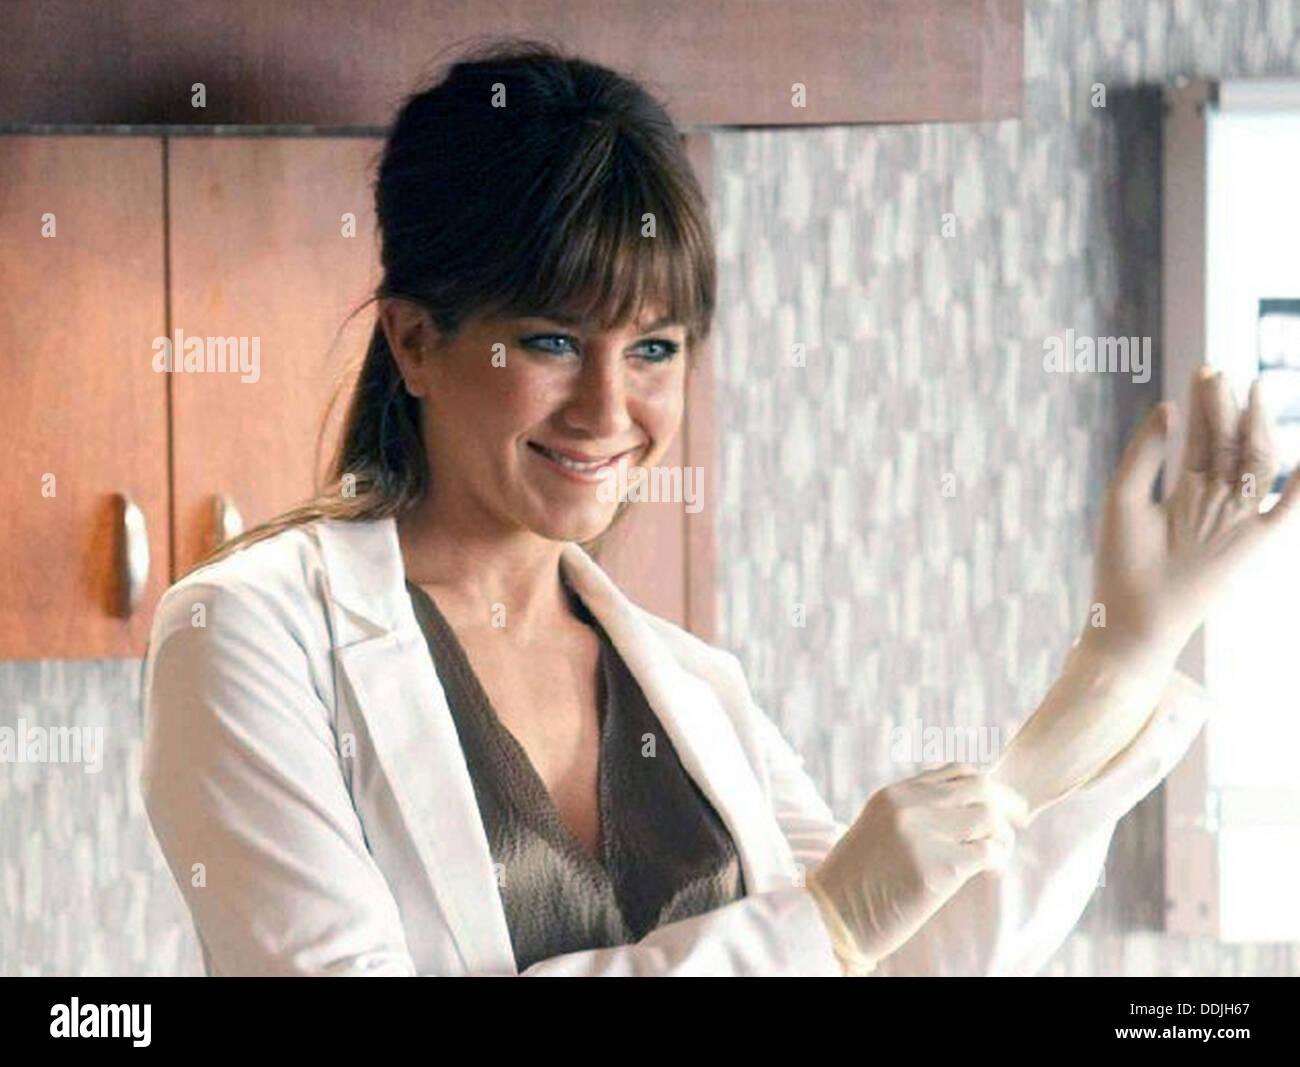 Horrible Bosses 2011 New Line Cinema Film With Jennifer Aniston Stock Photo Alamy